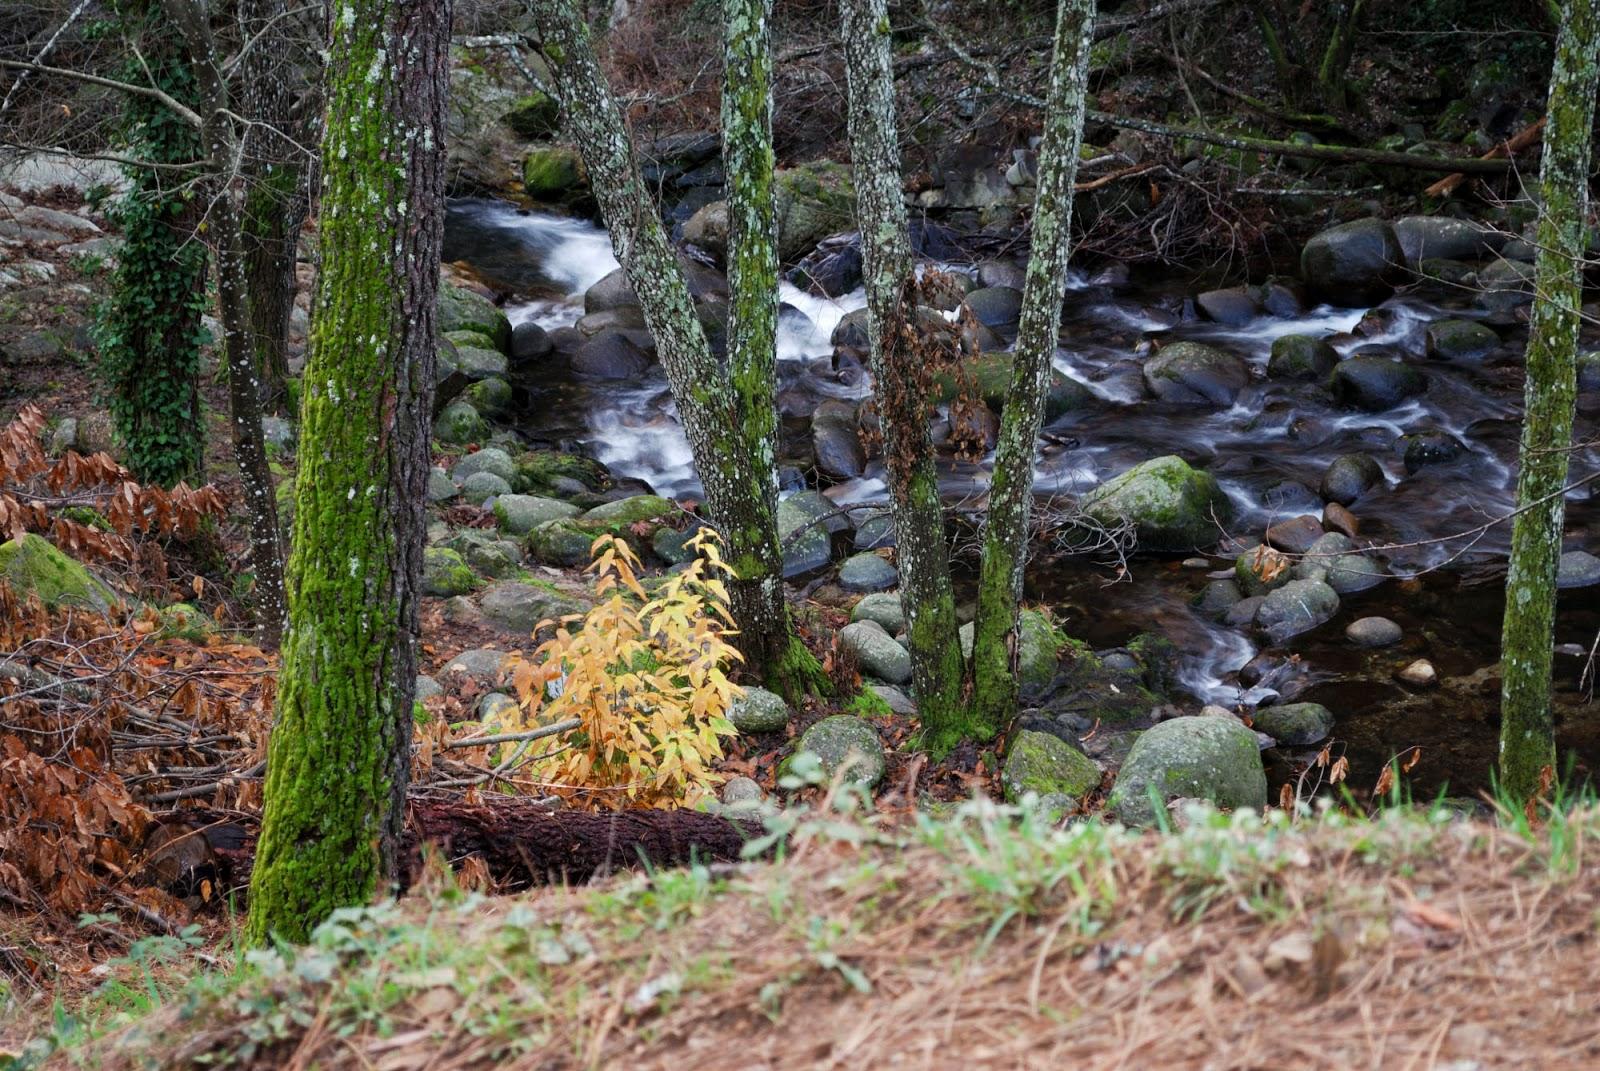 rio pelayos sierra gredos valle tietar avila